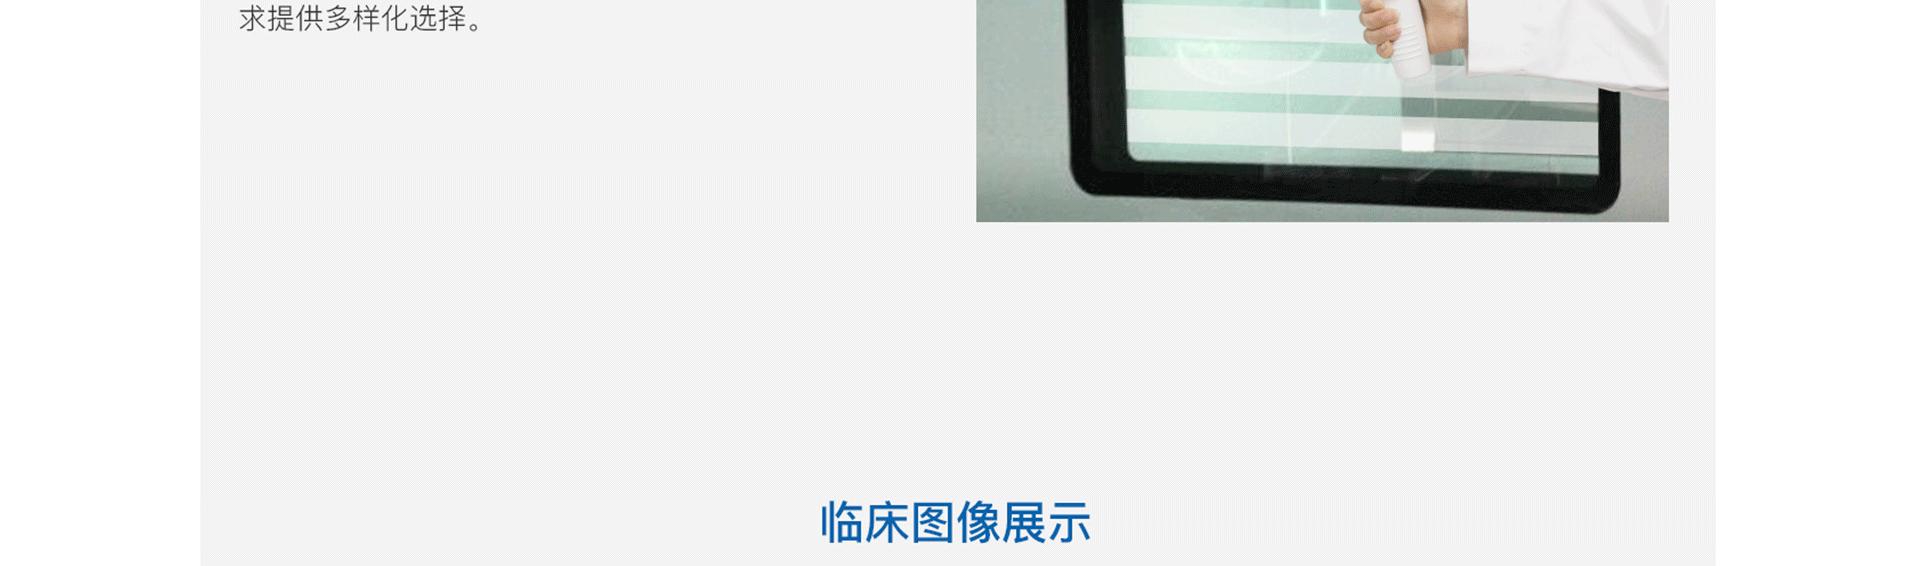 MobileCooper 紫晶